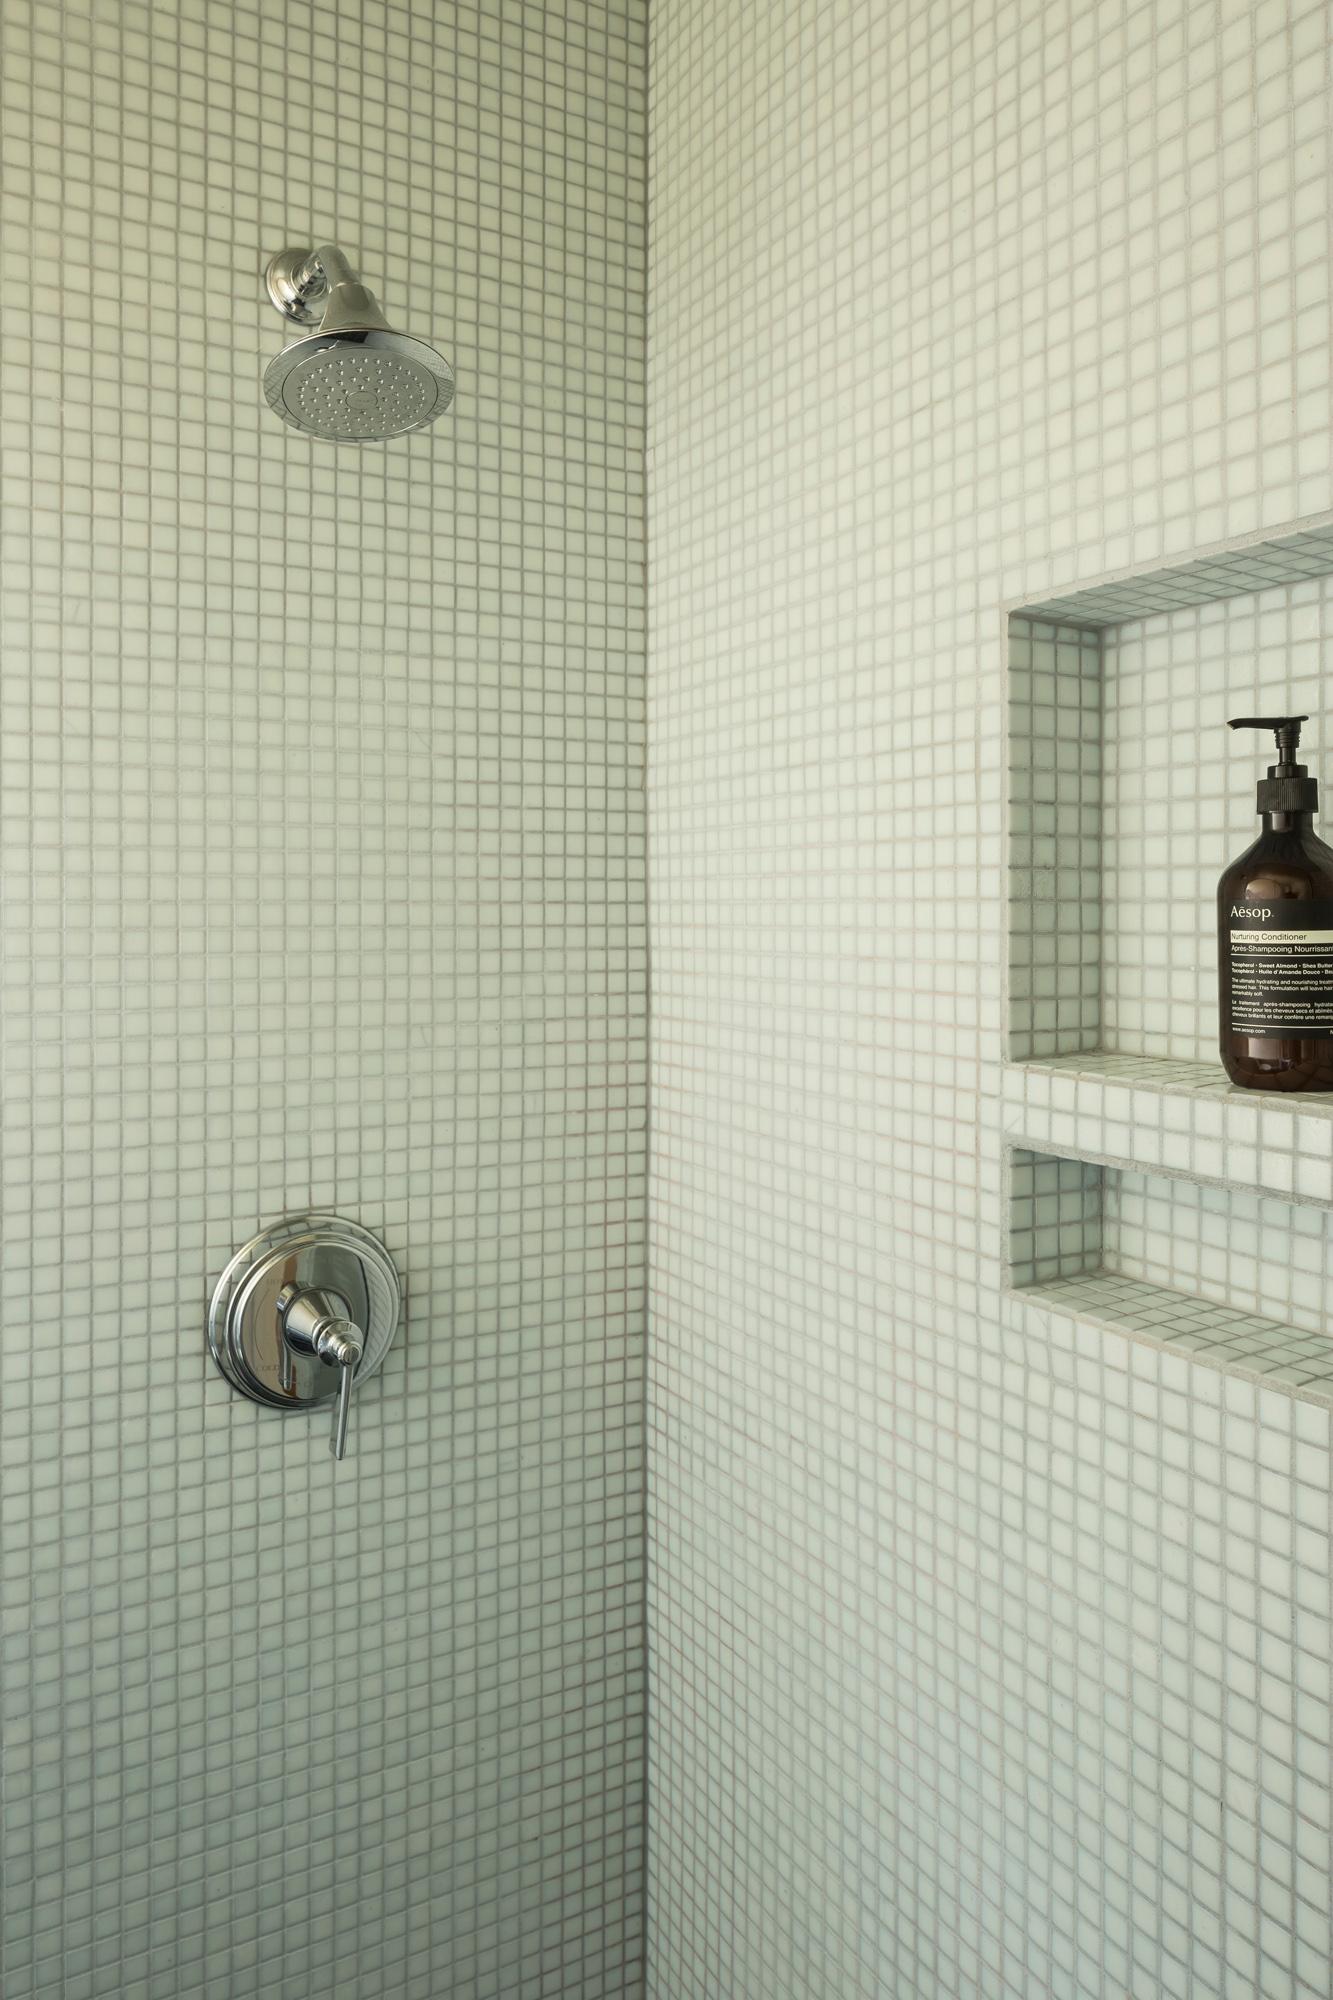 Guest_Bath_9631.jpg